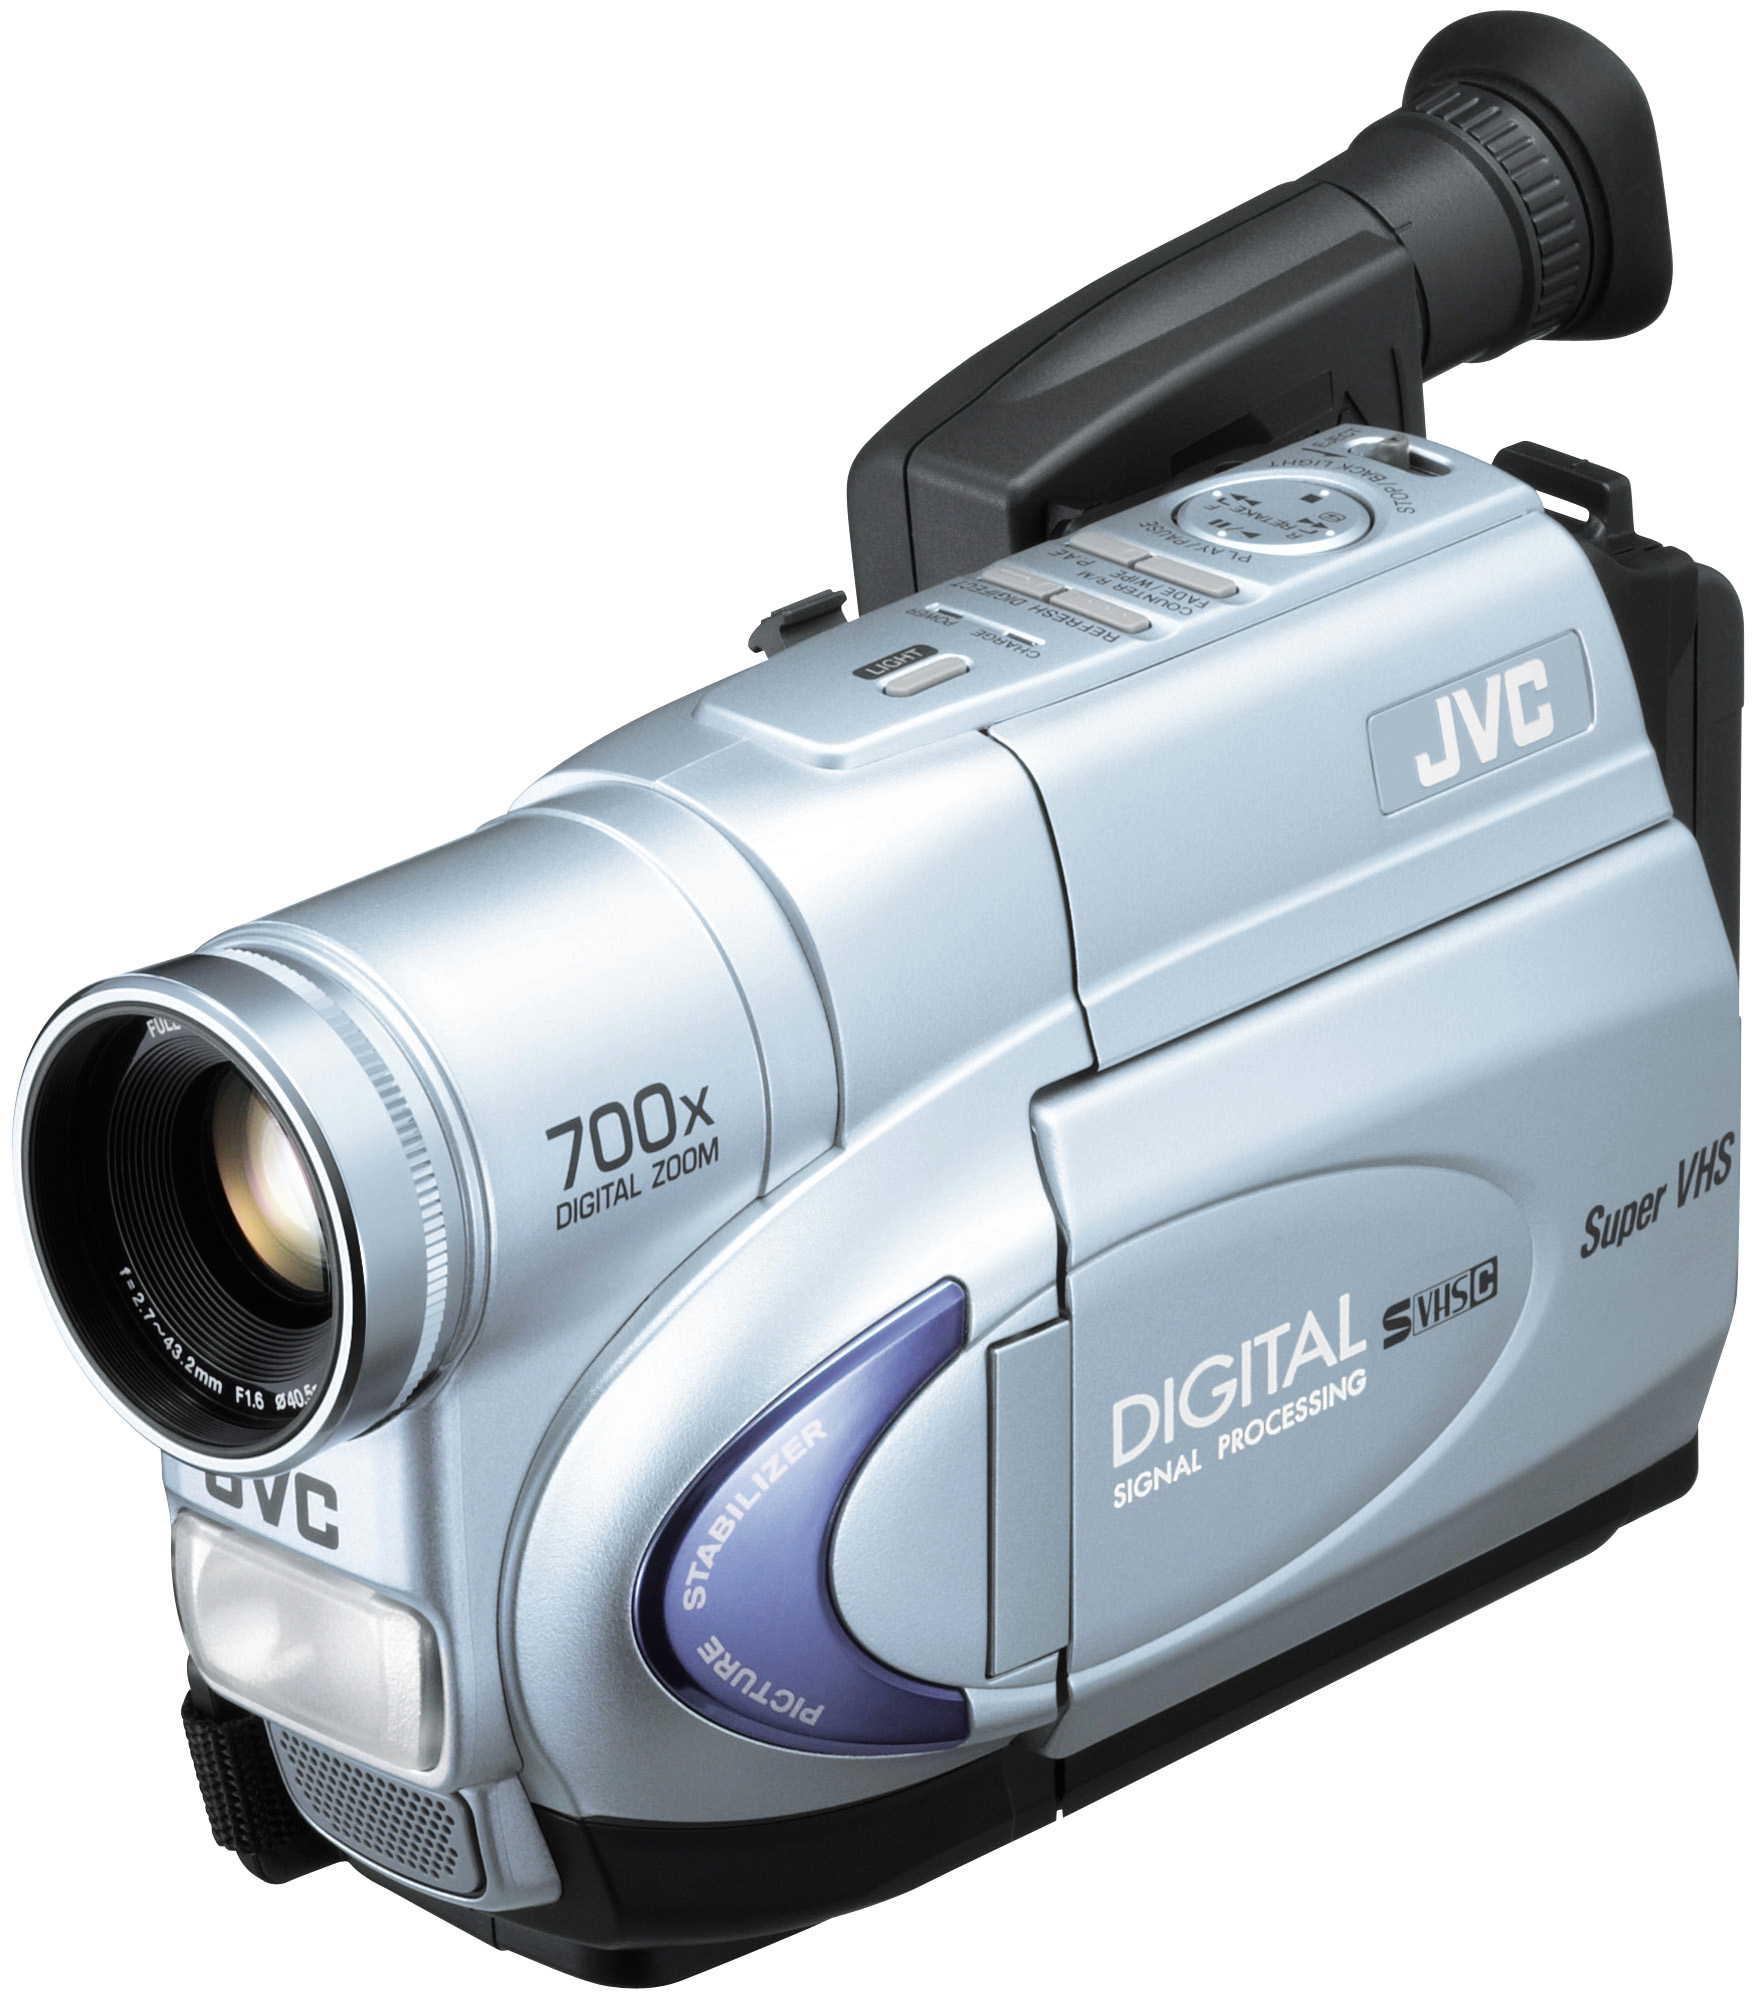 JVC GR SXM265US S VHS C Camcorder 16x Optical 700x Digital Zoom Refurbished